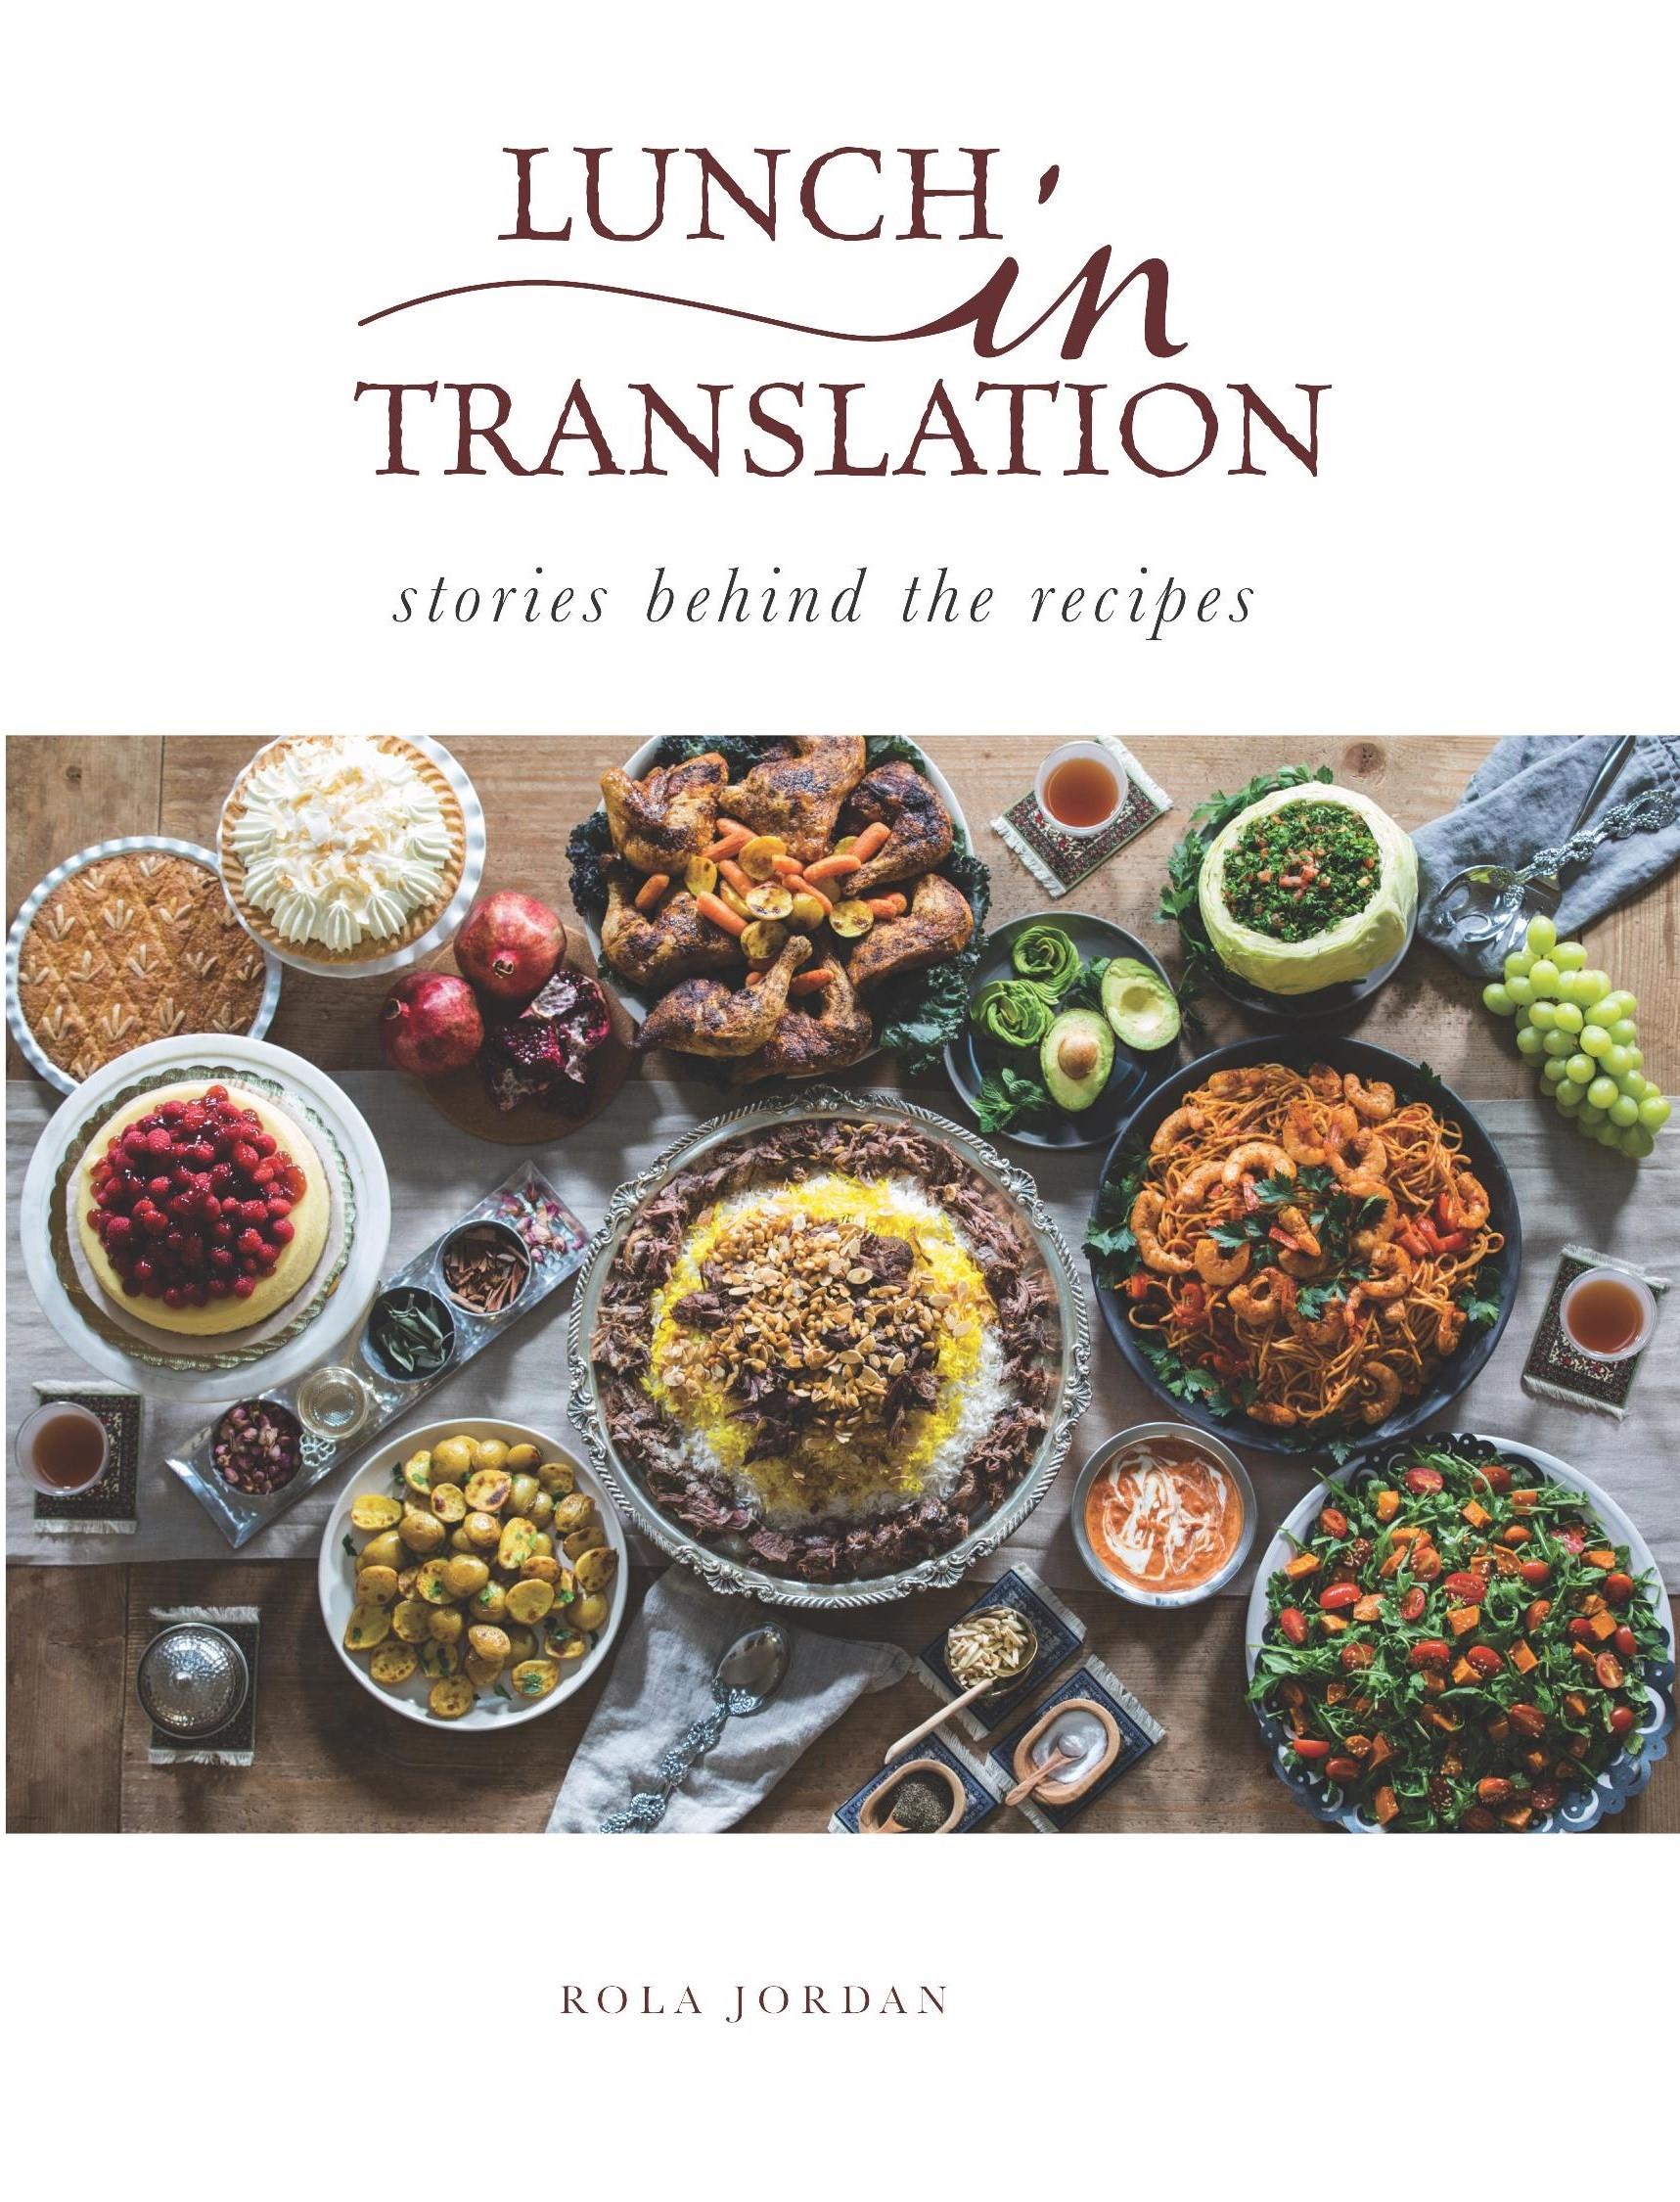 180101-Rola-Jordan-Lunch-In-Translation-Book-Cover-Rev1 (3)_Page_1.jpeg